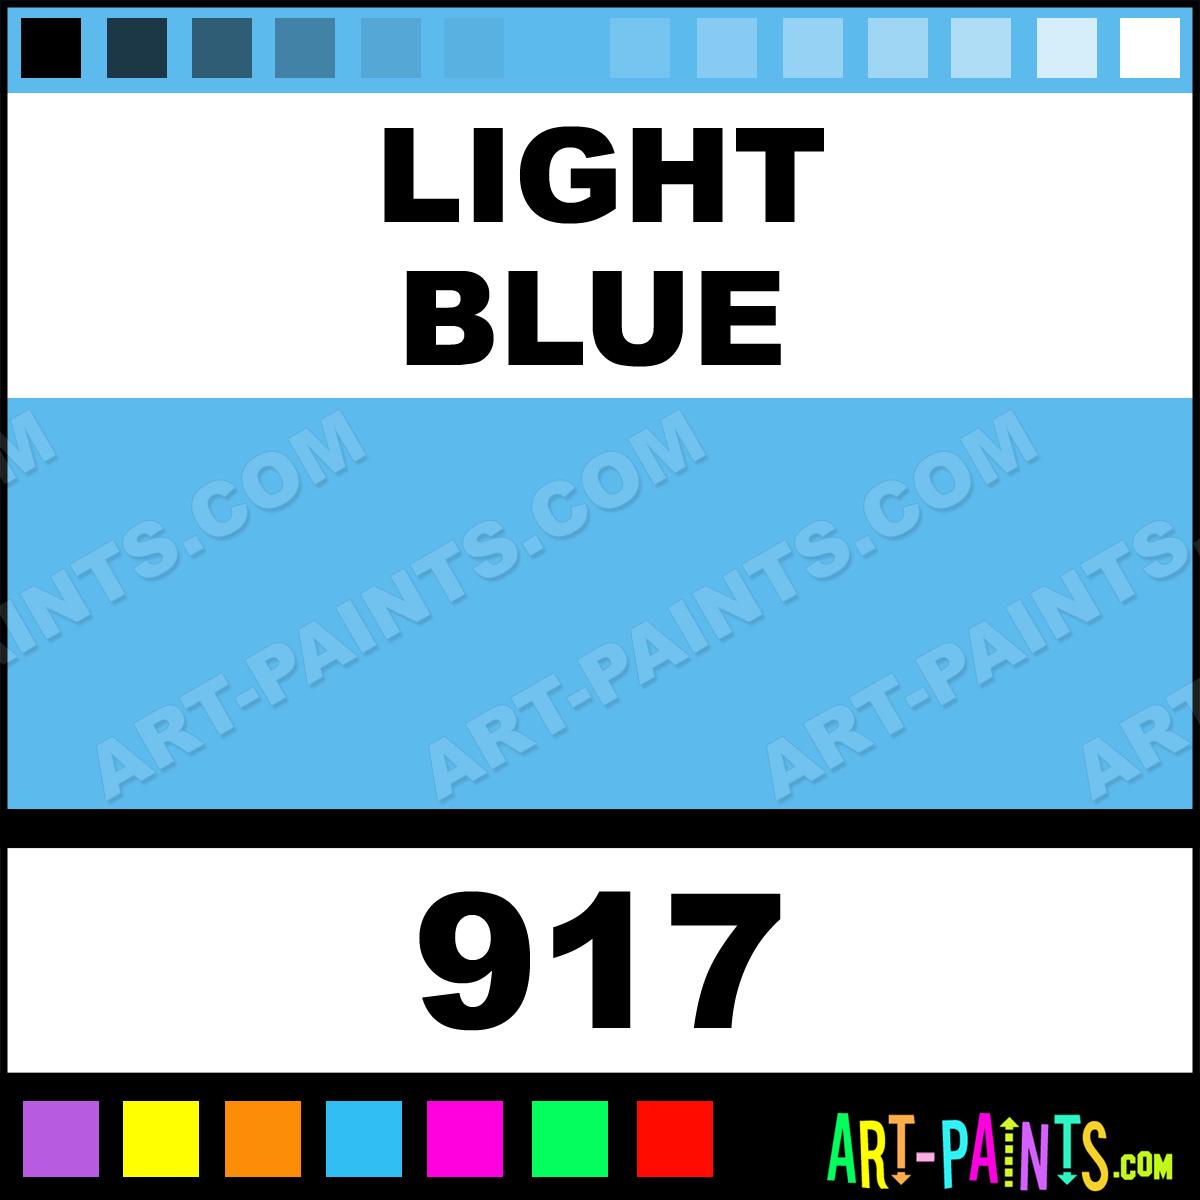 Light Blue Heavy Duty Auto Spray Paints 917 Light Blue